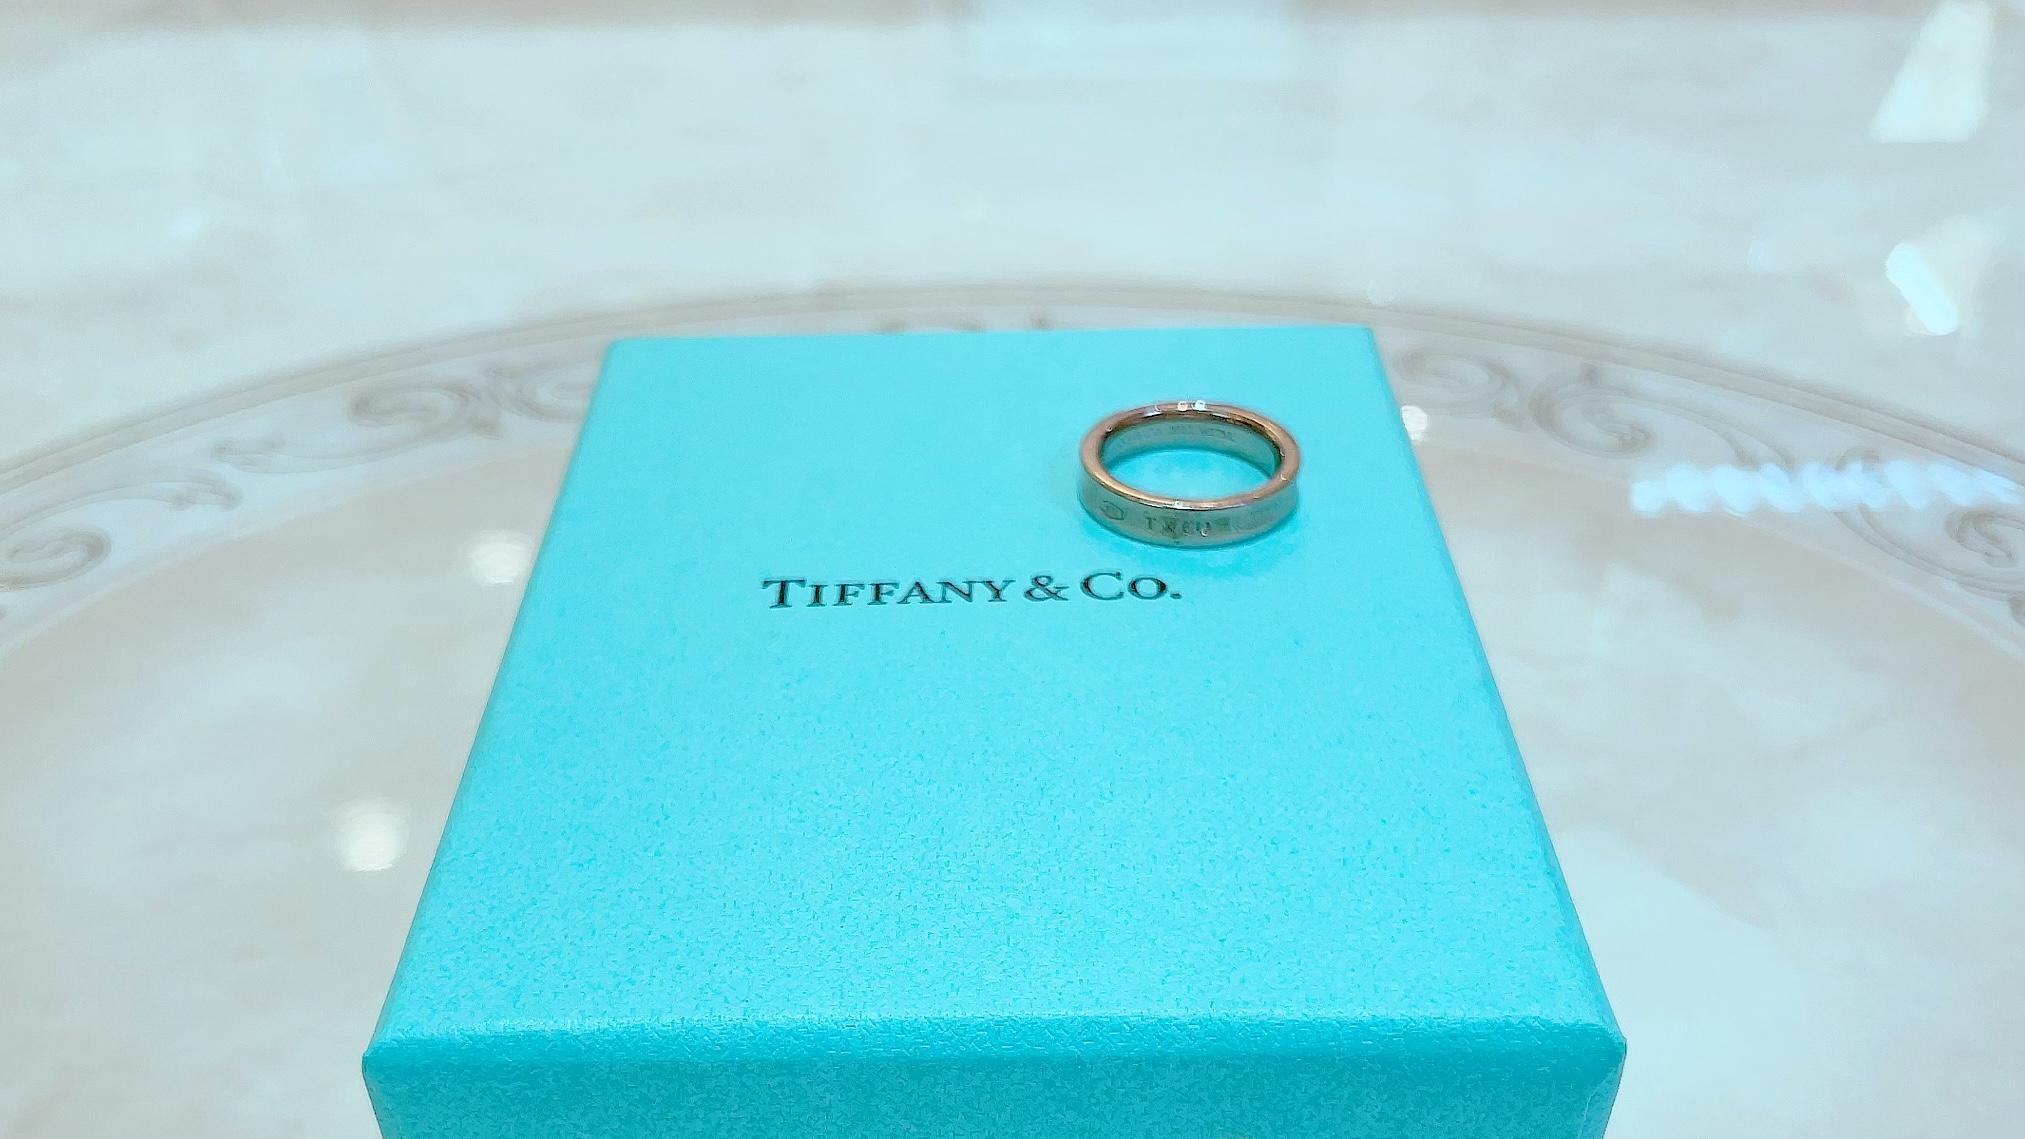 【買取速報】指輪、Tiffany & Co.-2021-09-30